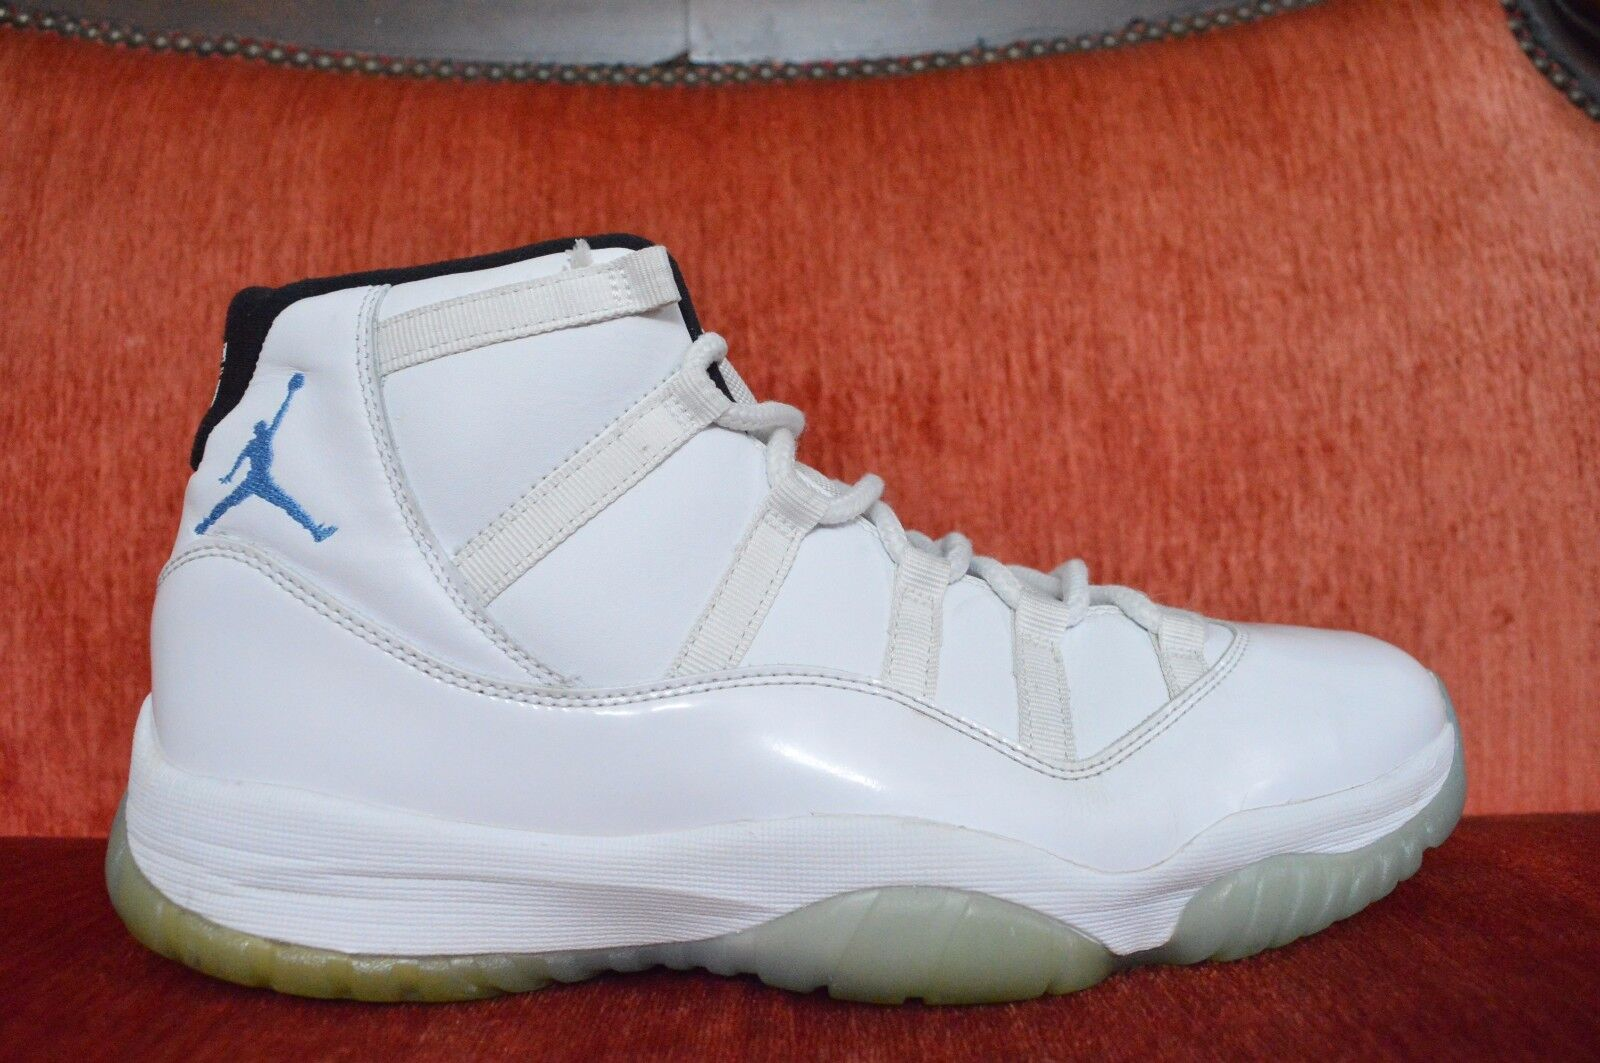 Nike Air Jordan Retro 11 XI Legend Blue Columbia Comfortable Wild casual shoes